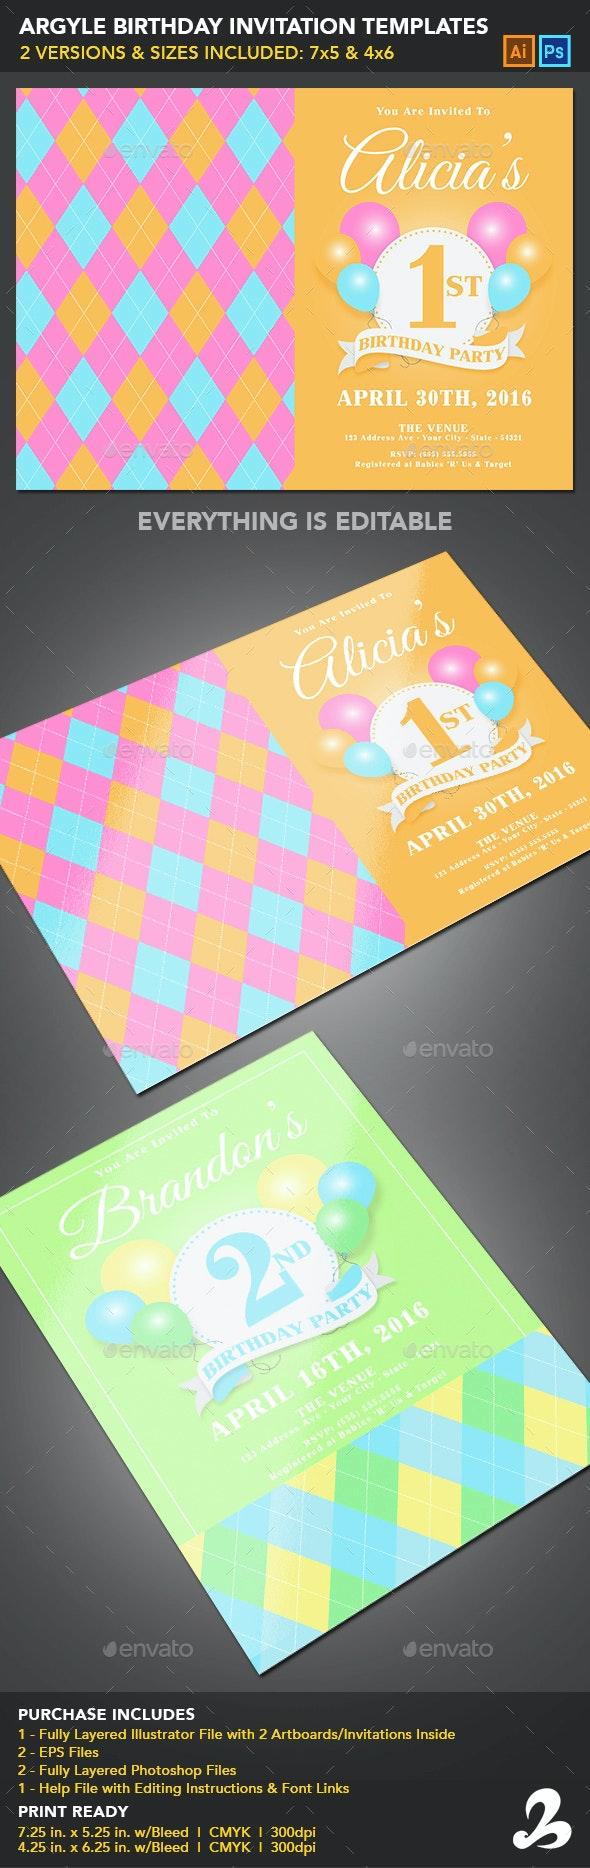 Birthday Invitation Templates - Argyle - Invitations Cards & Invites